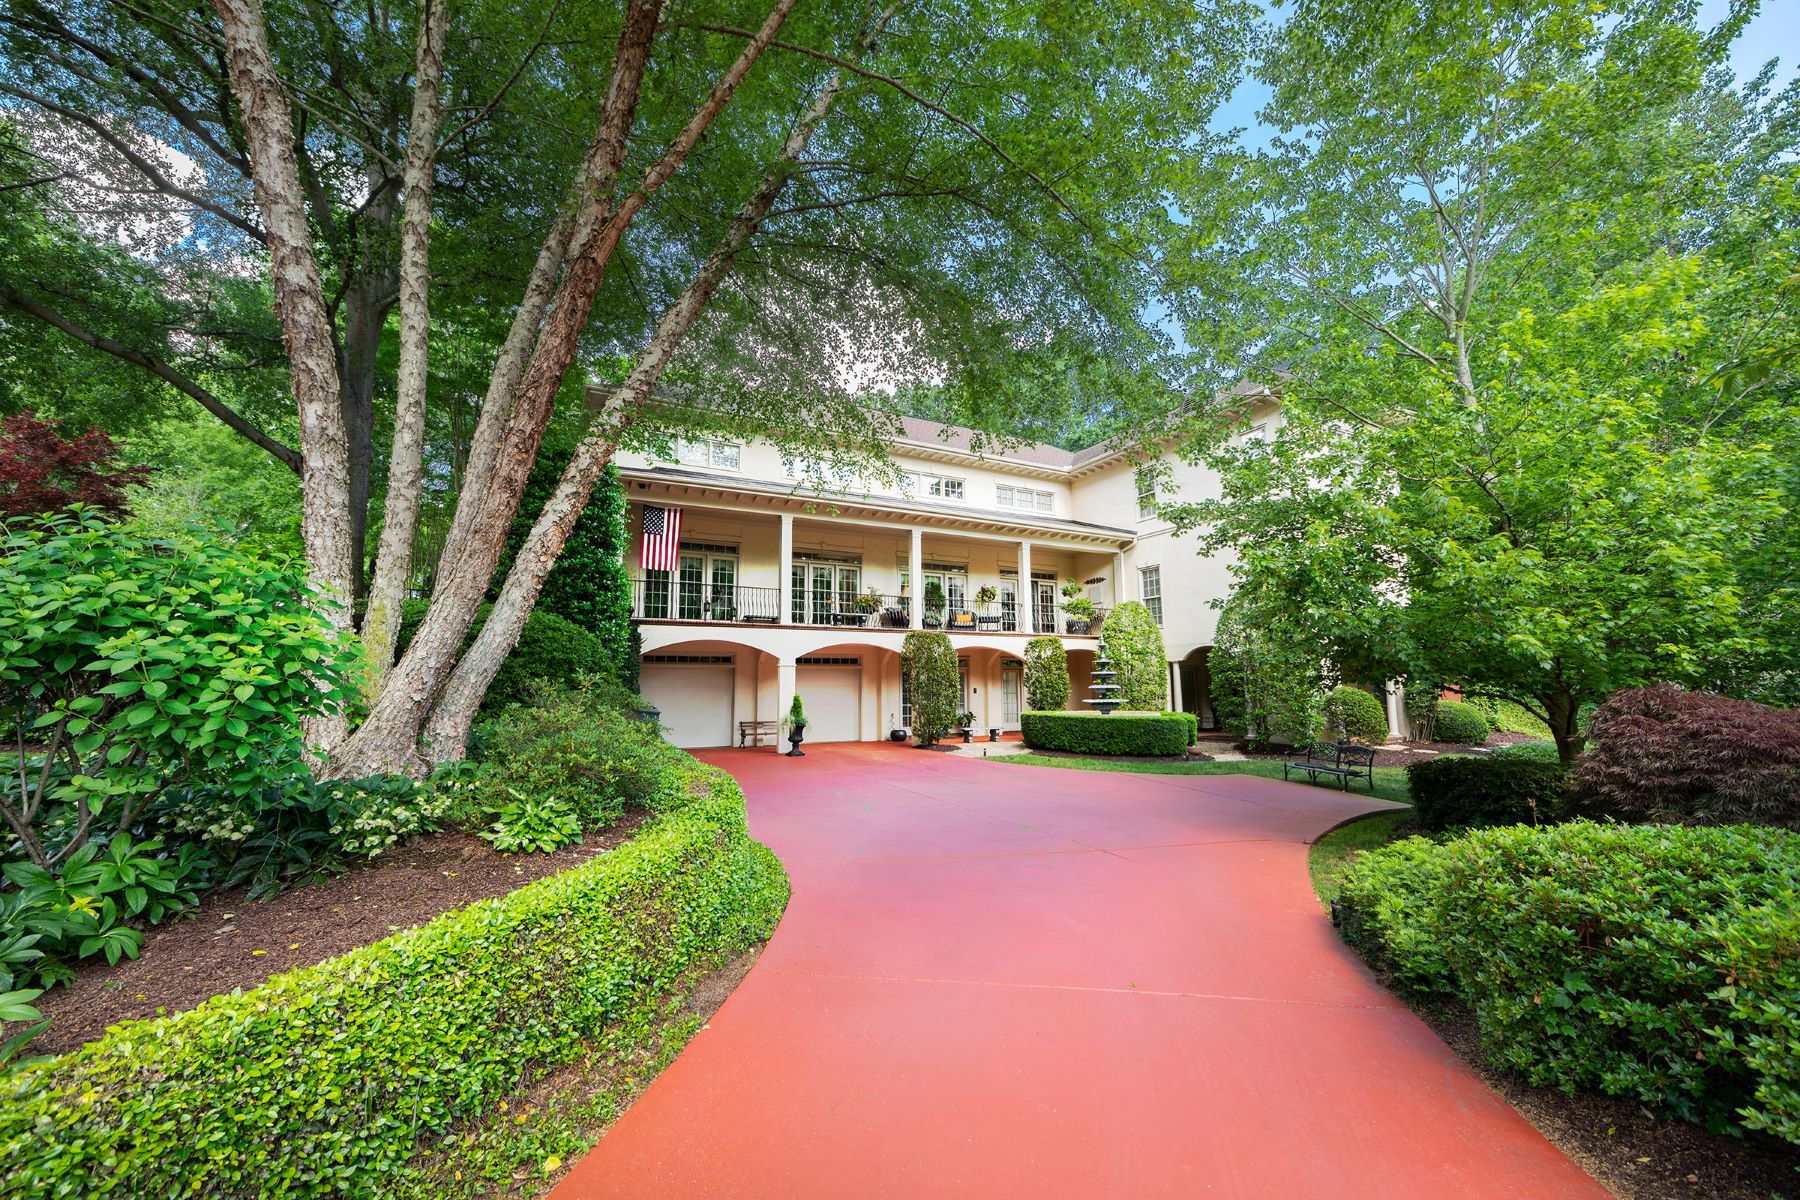 Single Family Homes for Sale at 27 Landsdown Avenue, Greenville, SC 29601 27 Landsdown Avenue Greenville, South Carolina 29601 United States